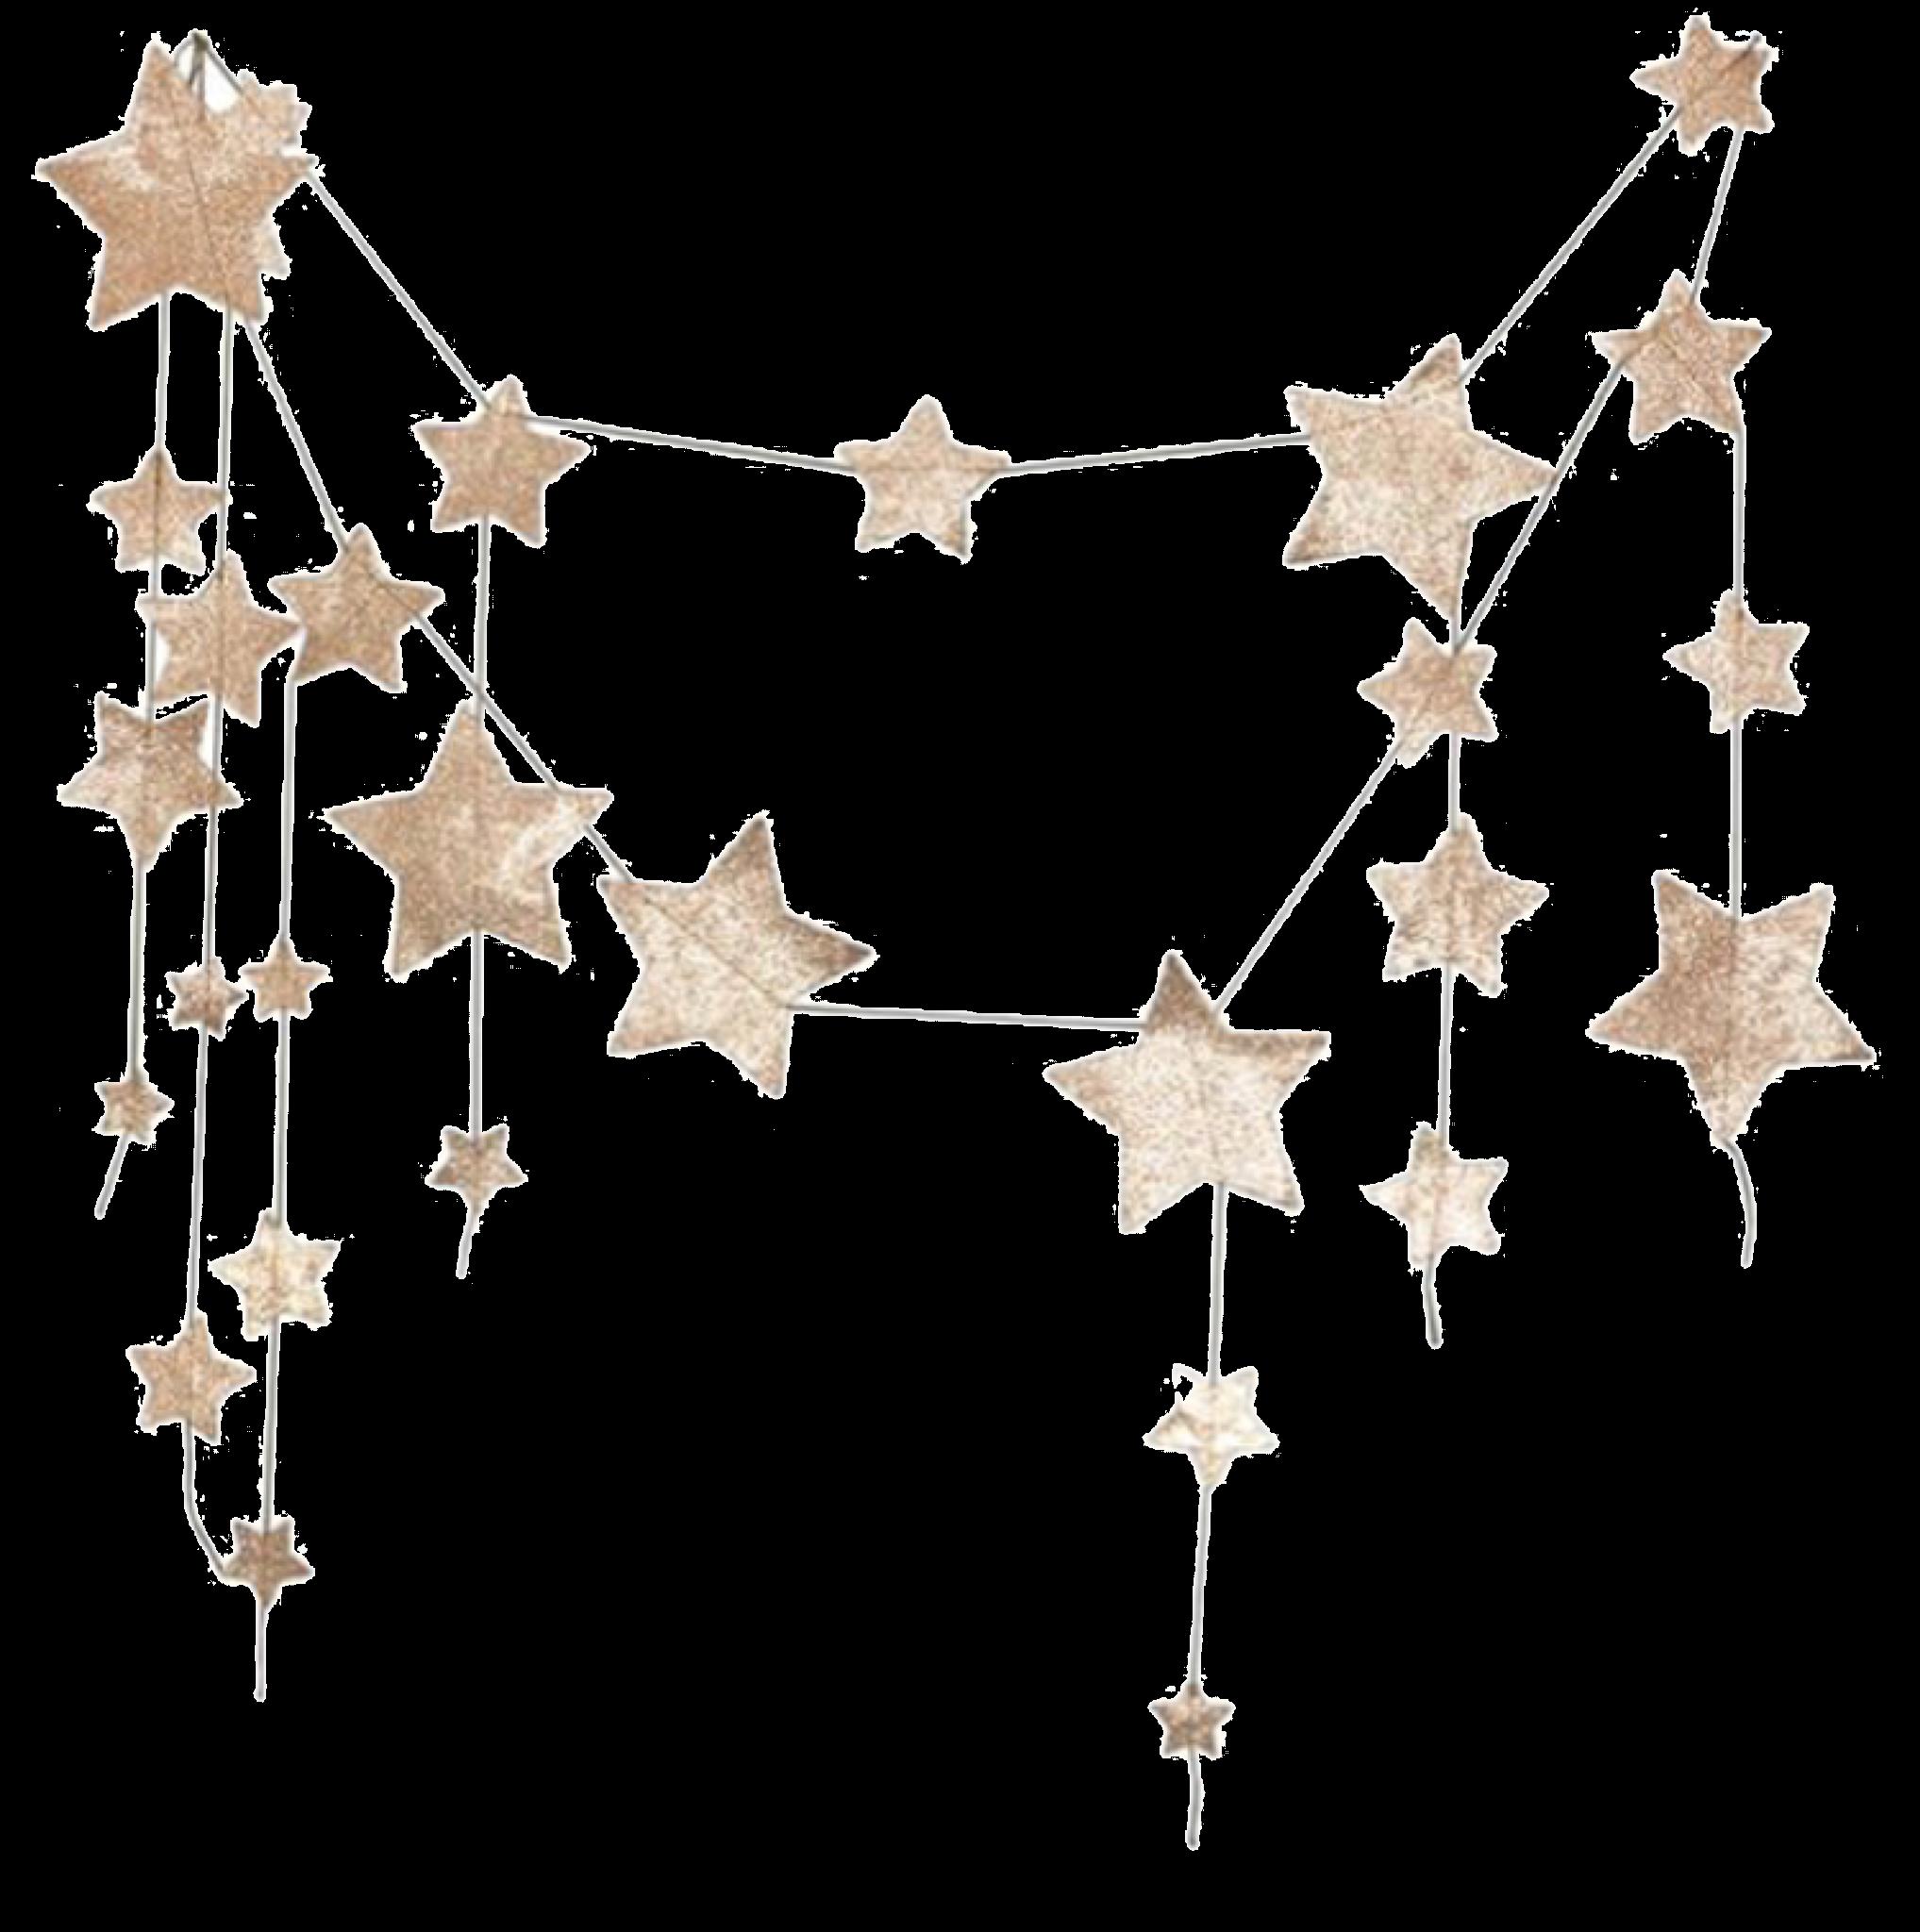 Pin By 𝐂𝐀𝐒𝐒 On Cuarto Star Garland Gold Glitter Glitter Stars